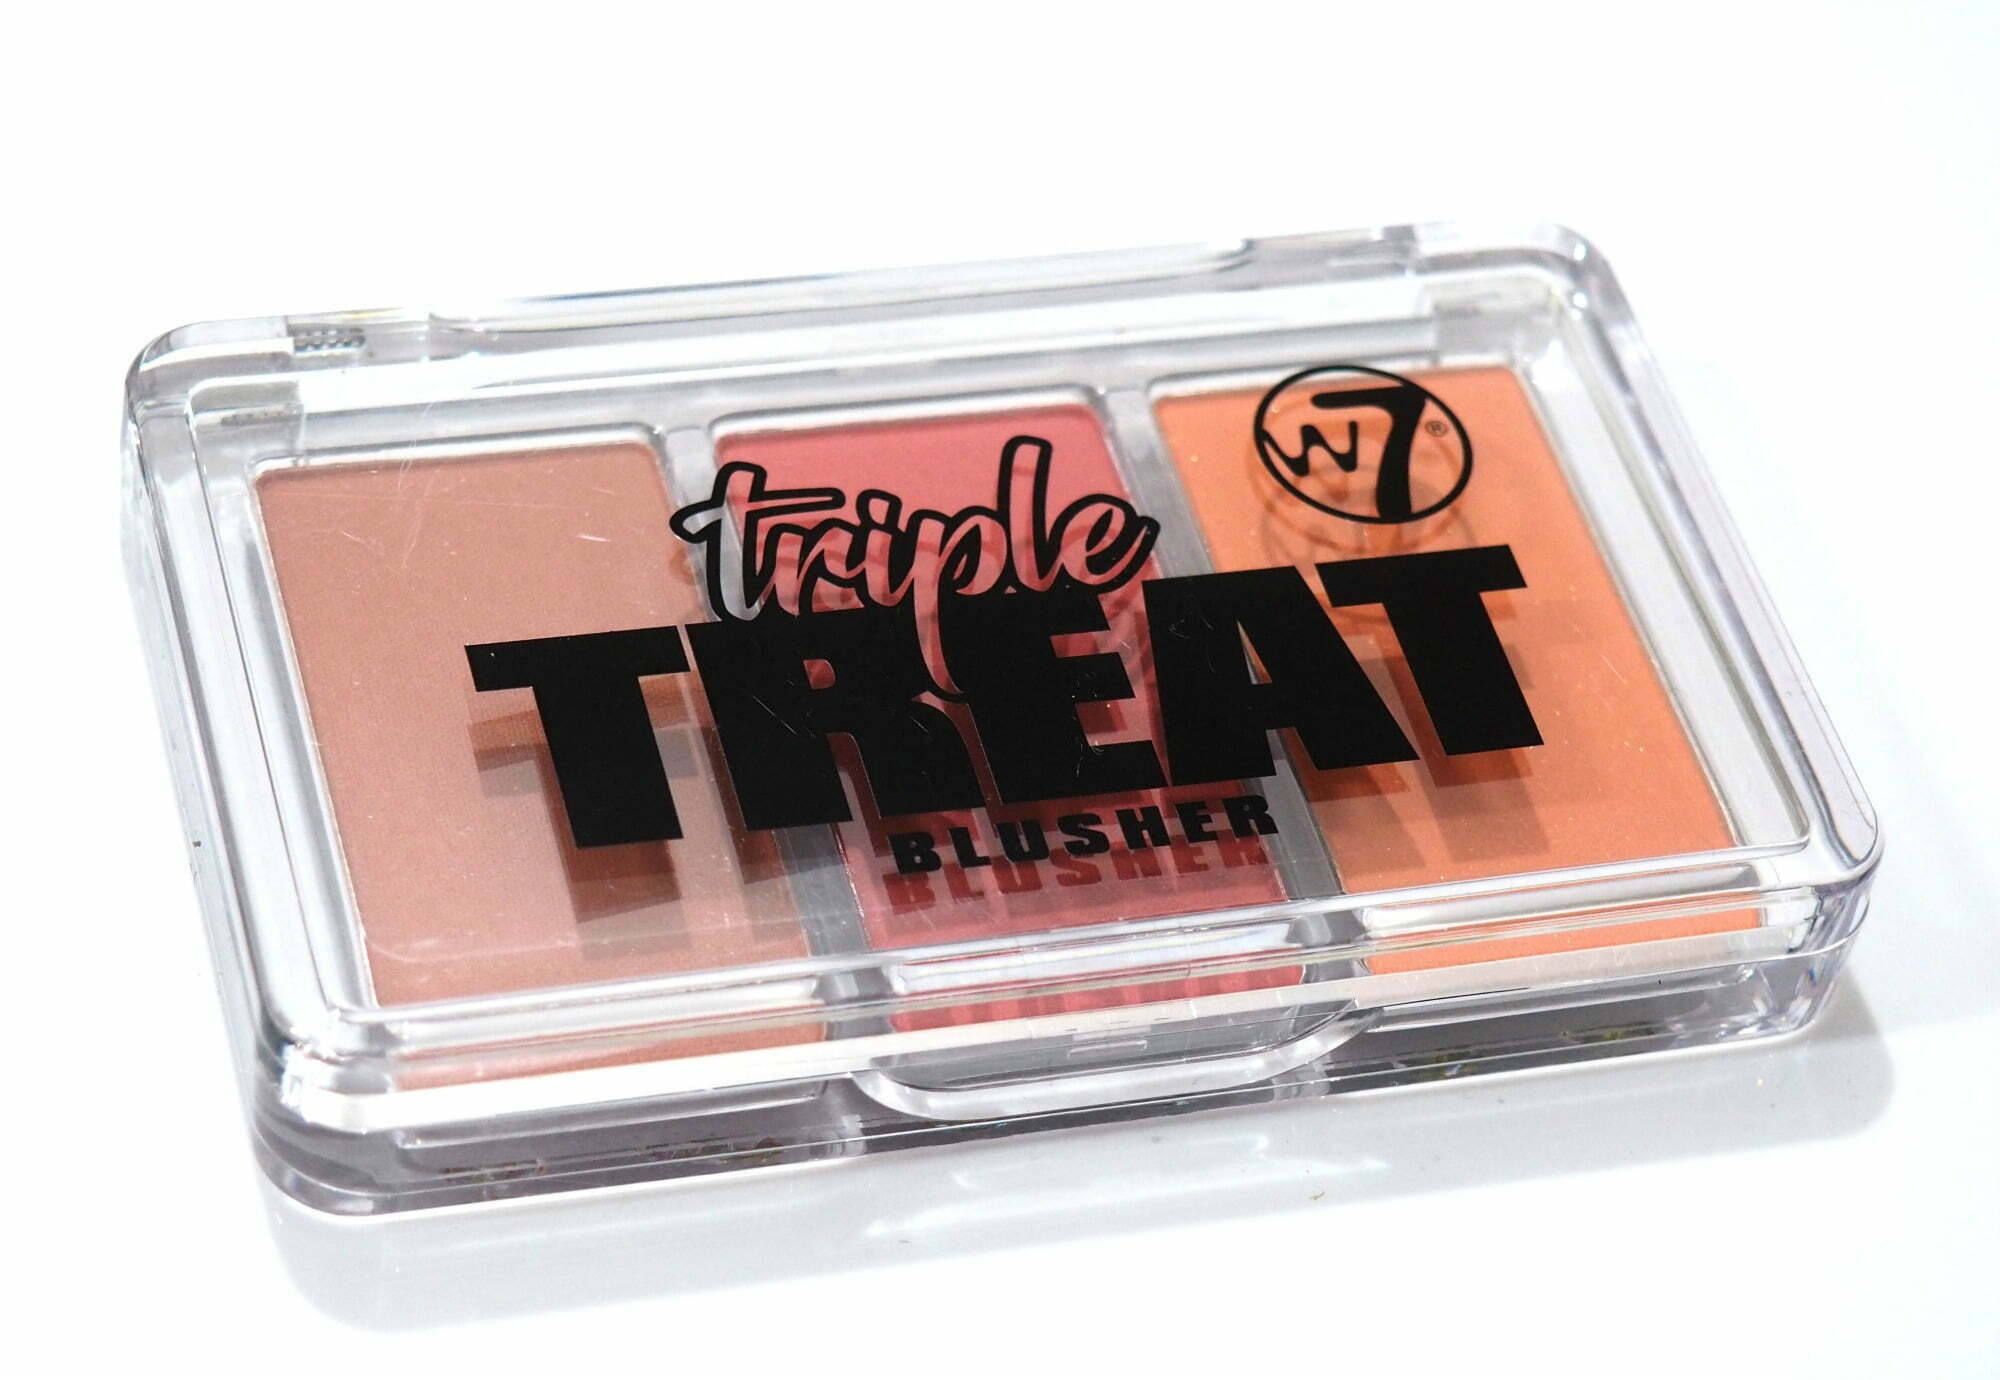 W7 Triple Threat Blusher Palette